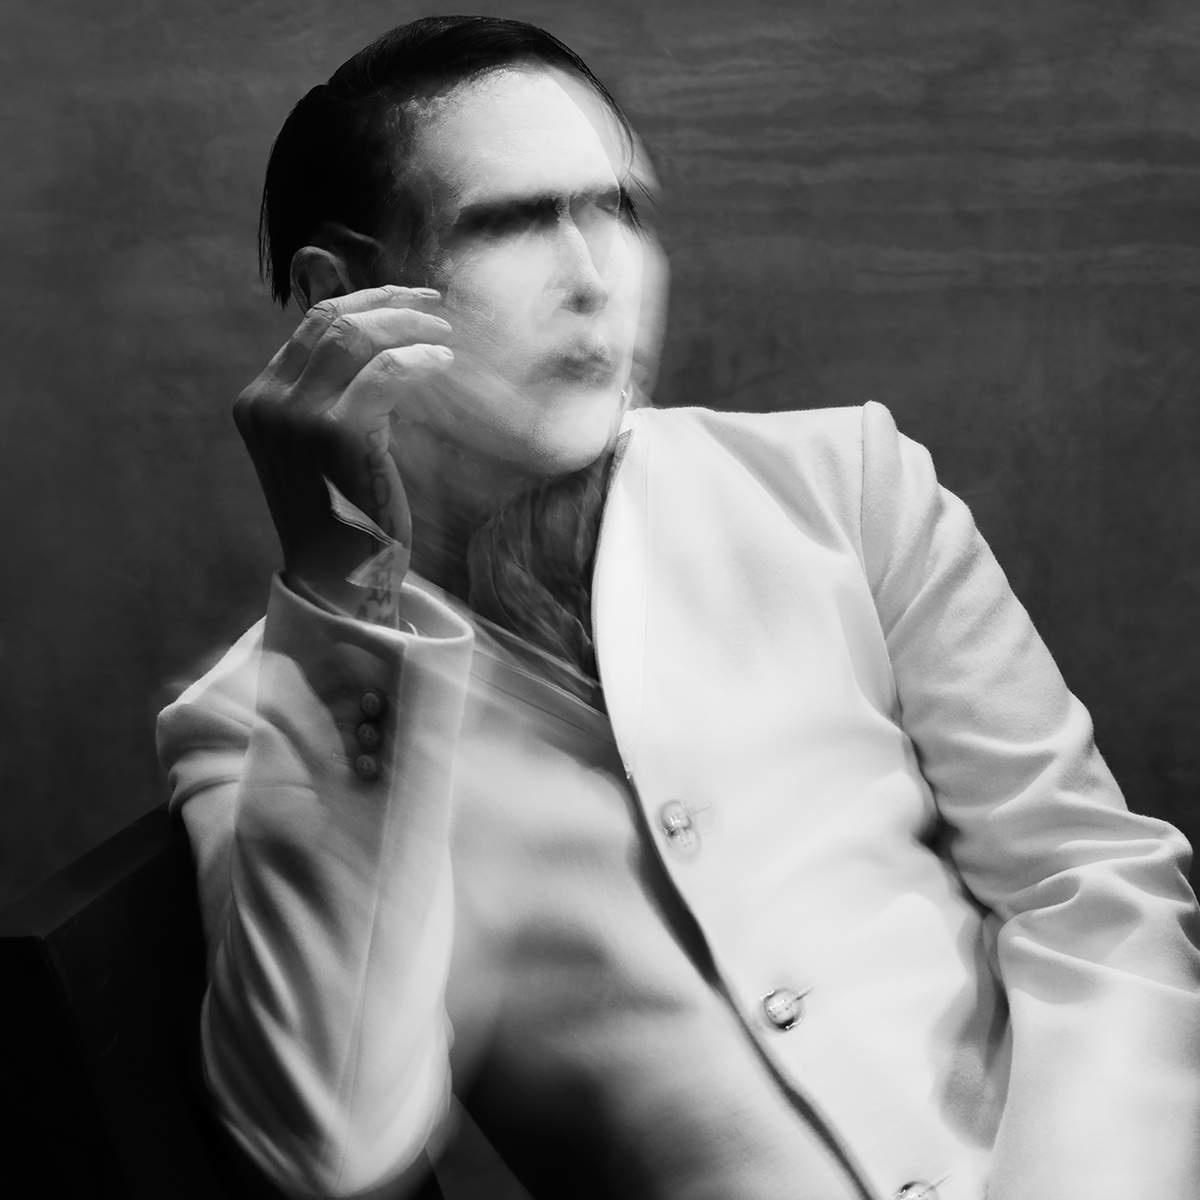 玛丽莲·曼森 Marilyn Manson – The Pale Emperor mp3歌曲试听的照片 - 2